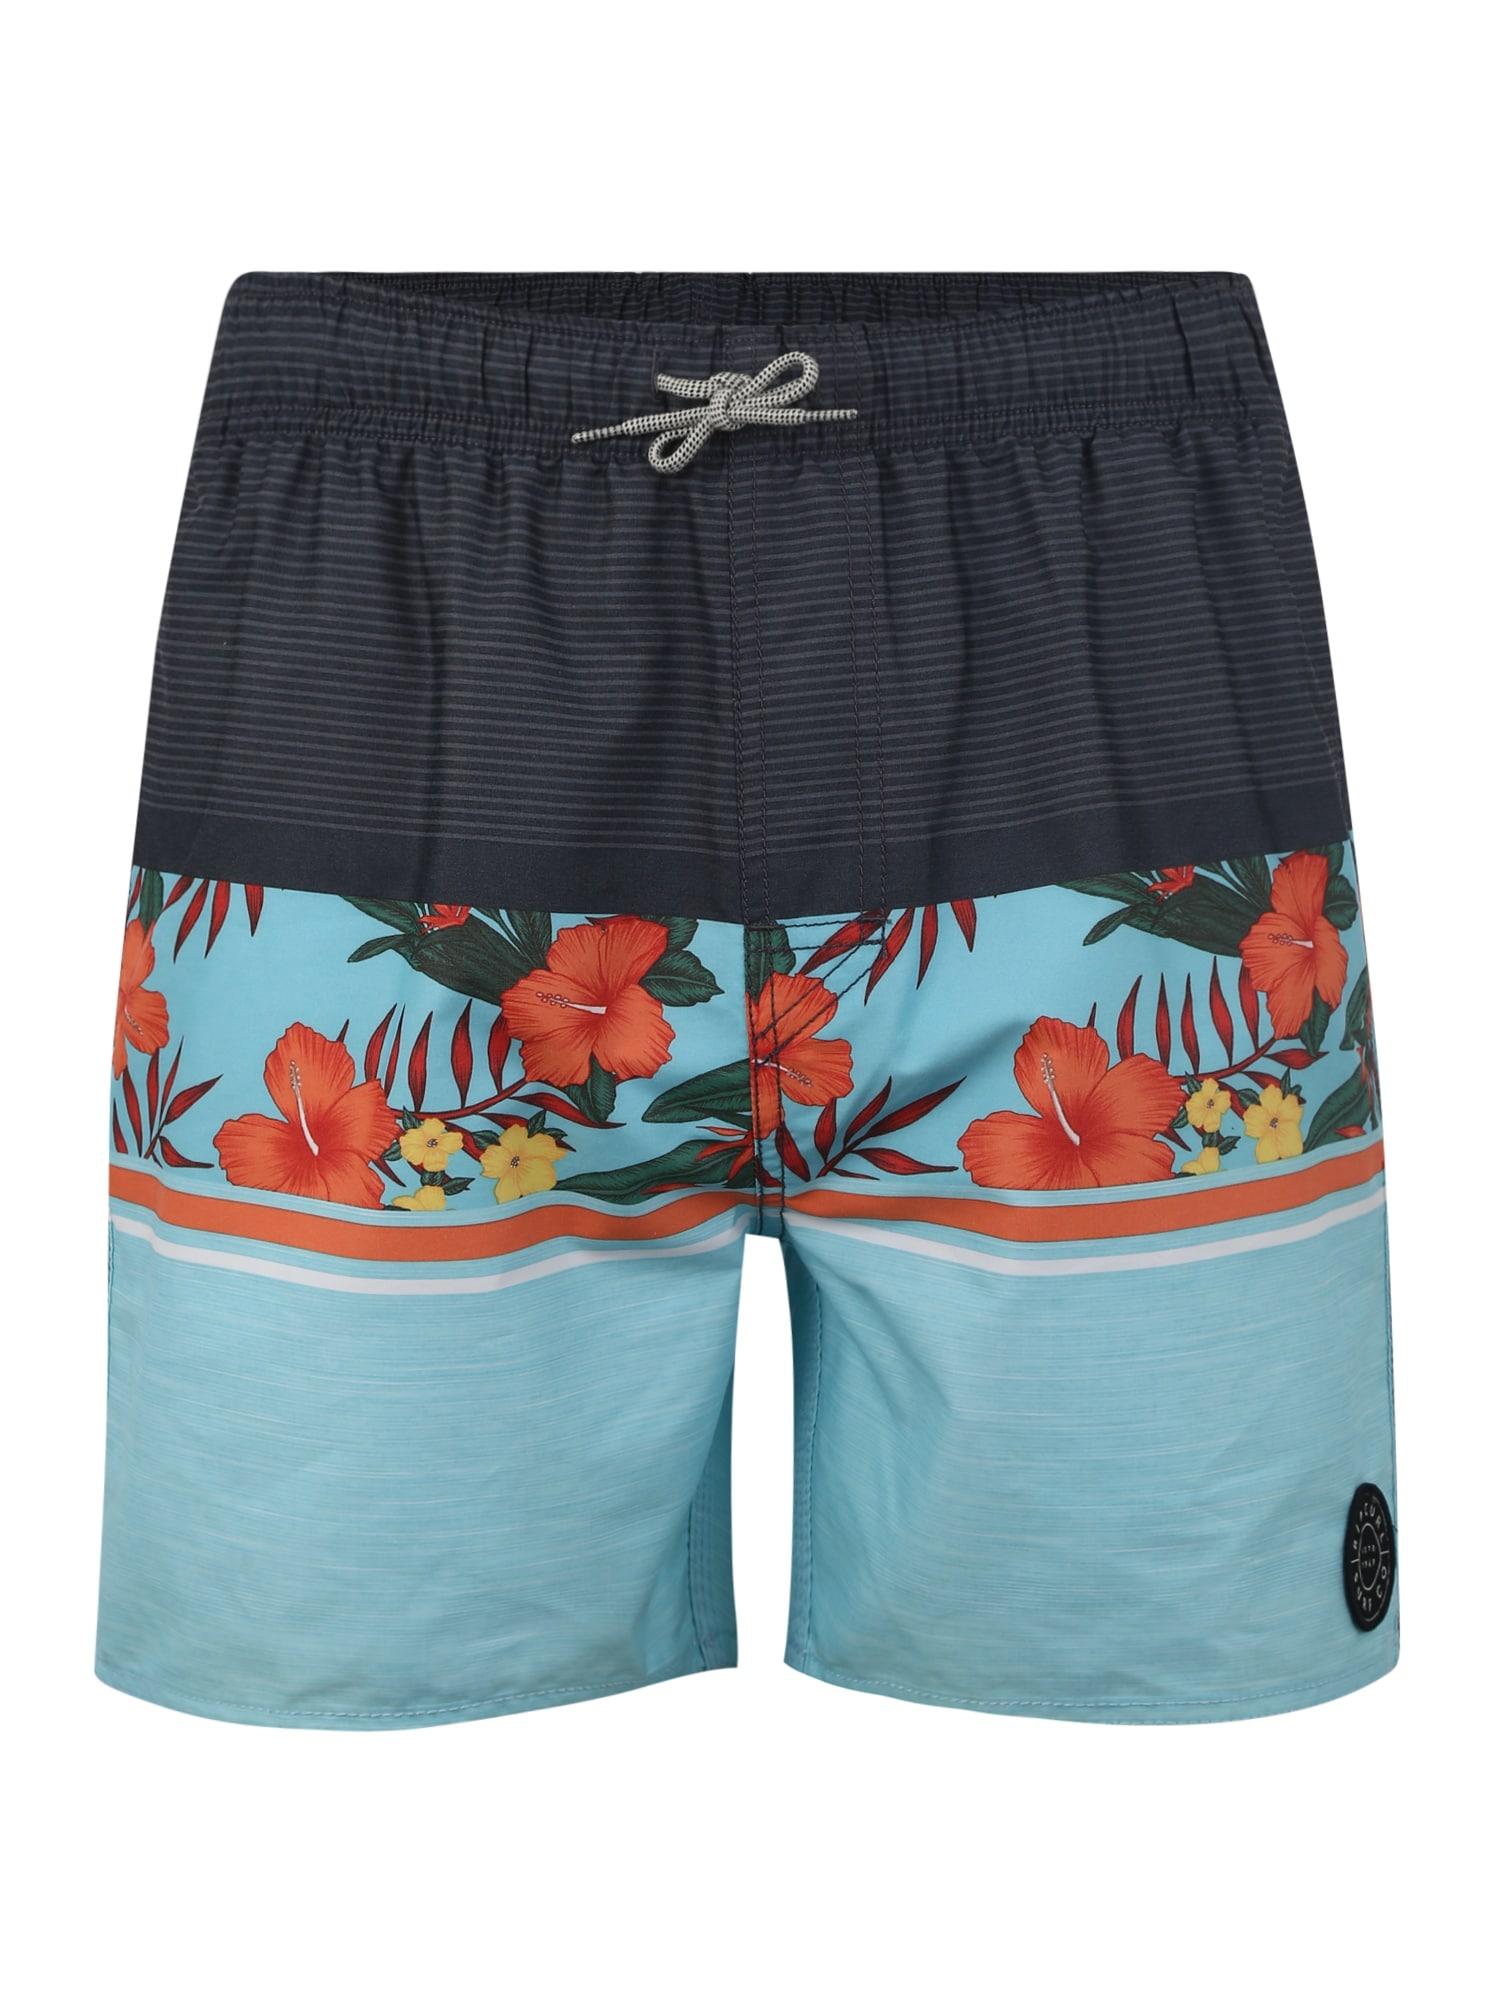 Plavecké šortky VOLLEY TEAM SPIRIT 16 mix barev RIP CURL